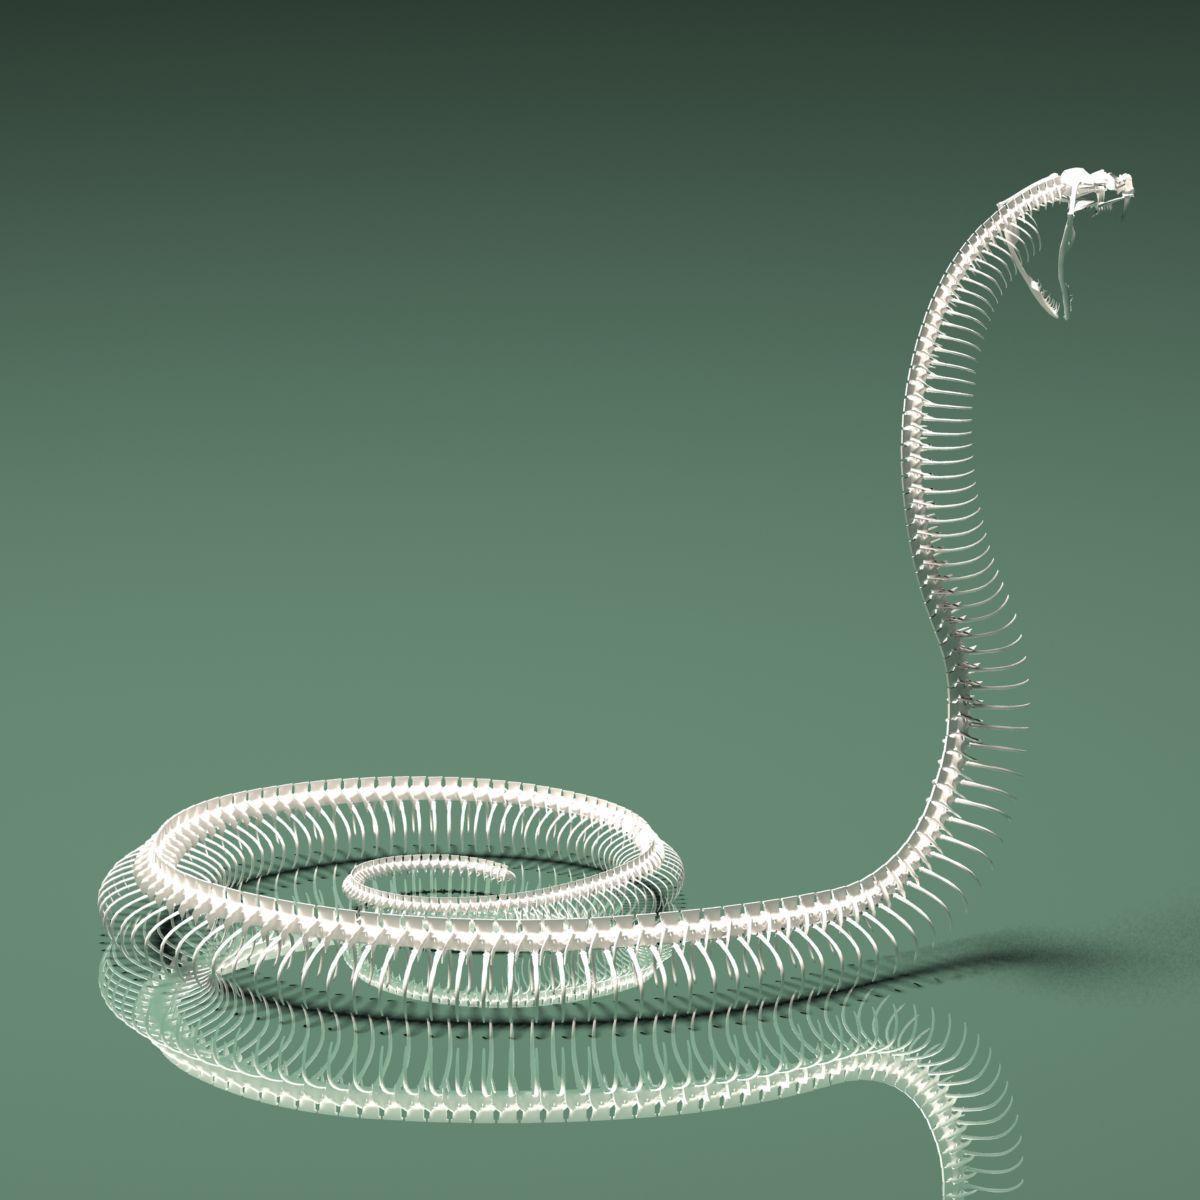 Anaconda skeleton - photo#18